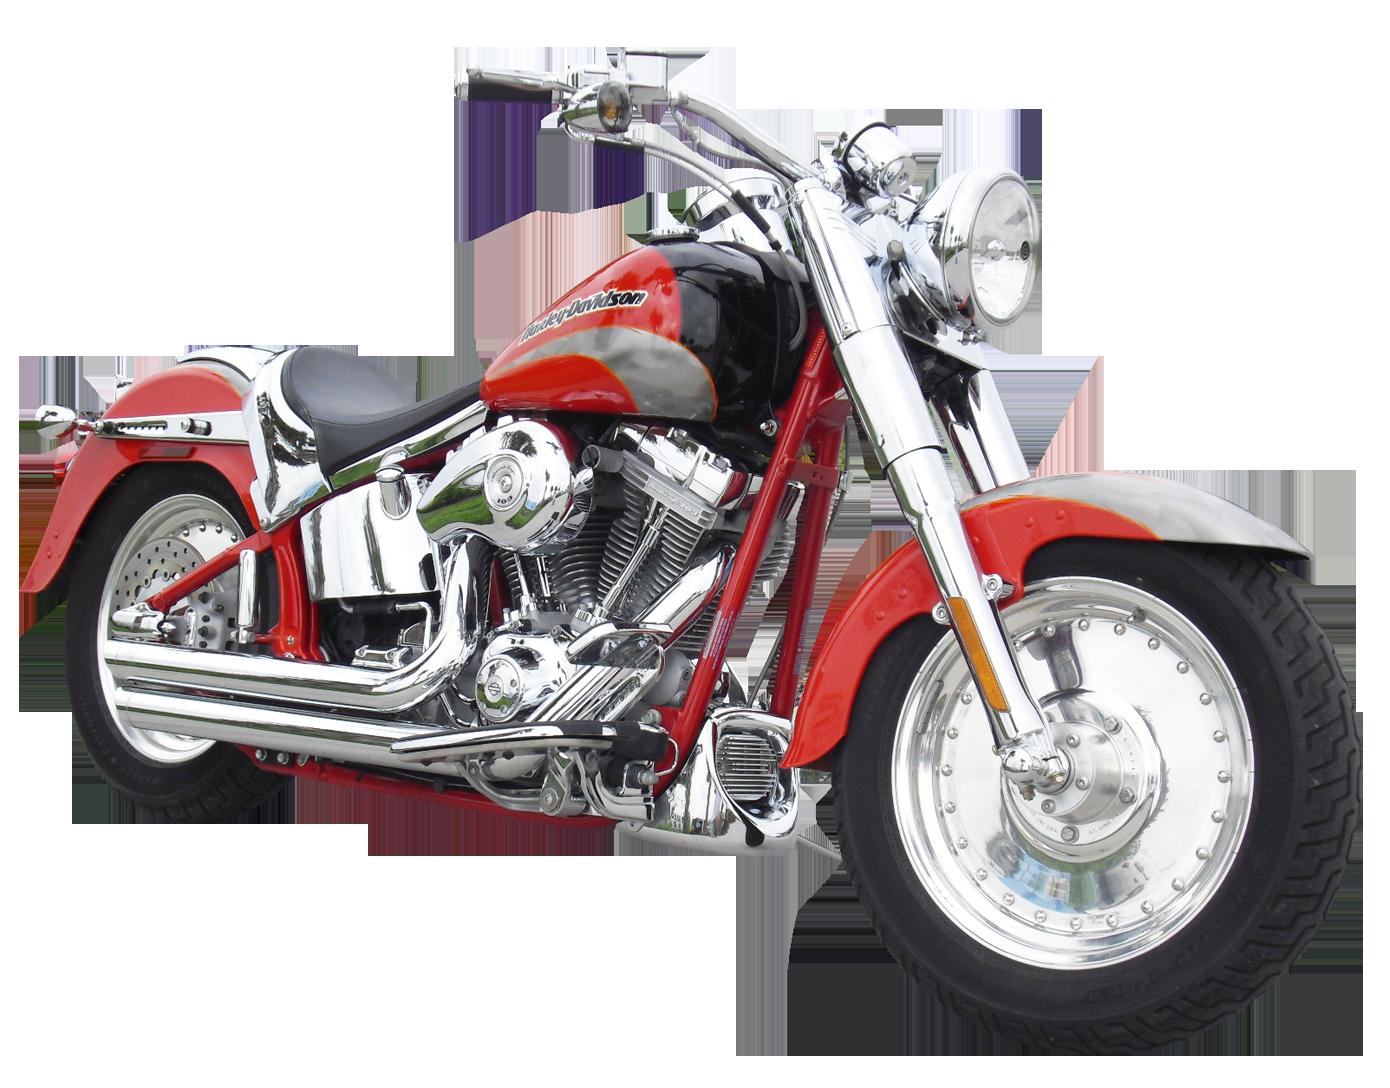 Harley Davidson Motorcycles Harley Davidson Harley Davidson Gear Harley Davidson Motorcycles